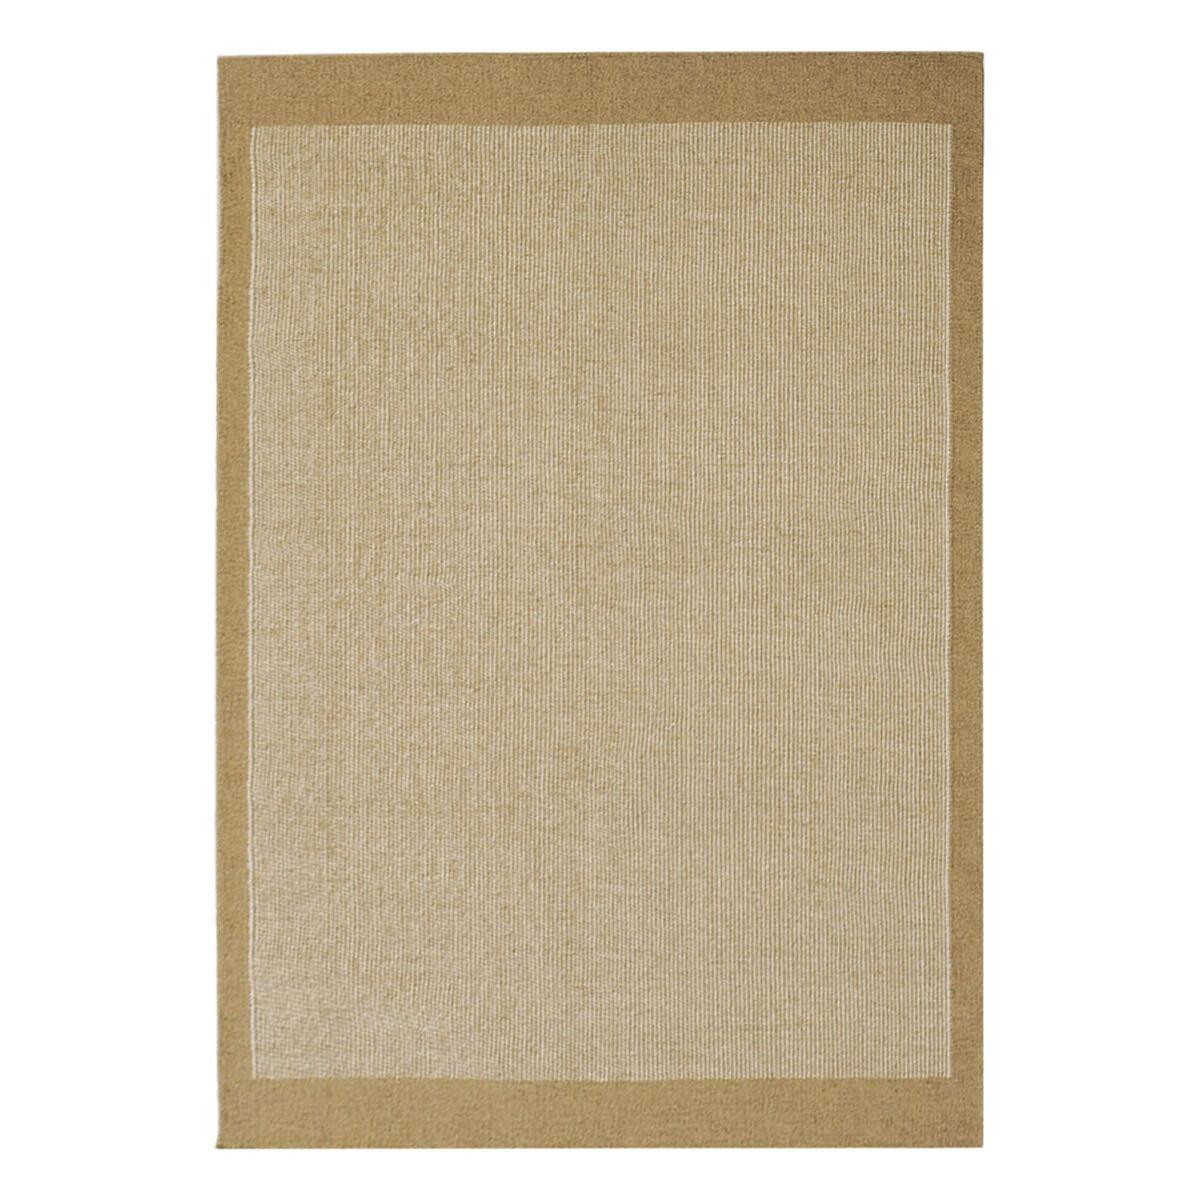 Tappeto in lana Jensen sabbia - 140x200 cm M066